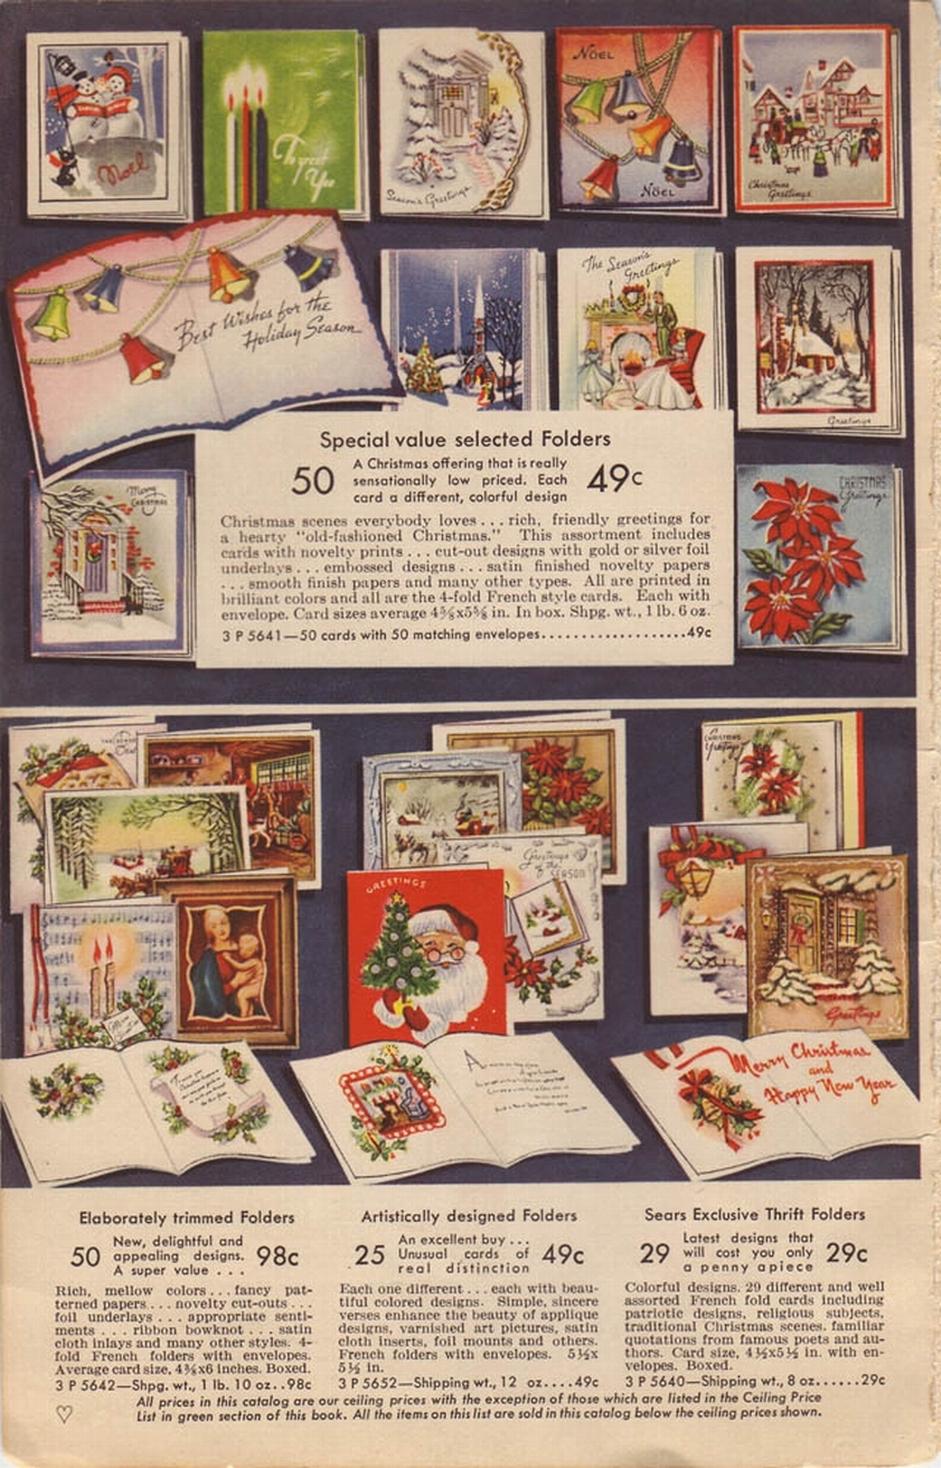 1942 SEARS CHRISTMAS CARD PAGE